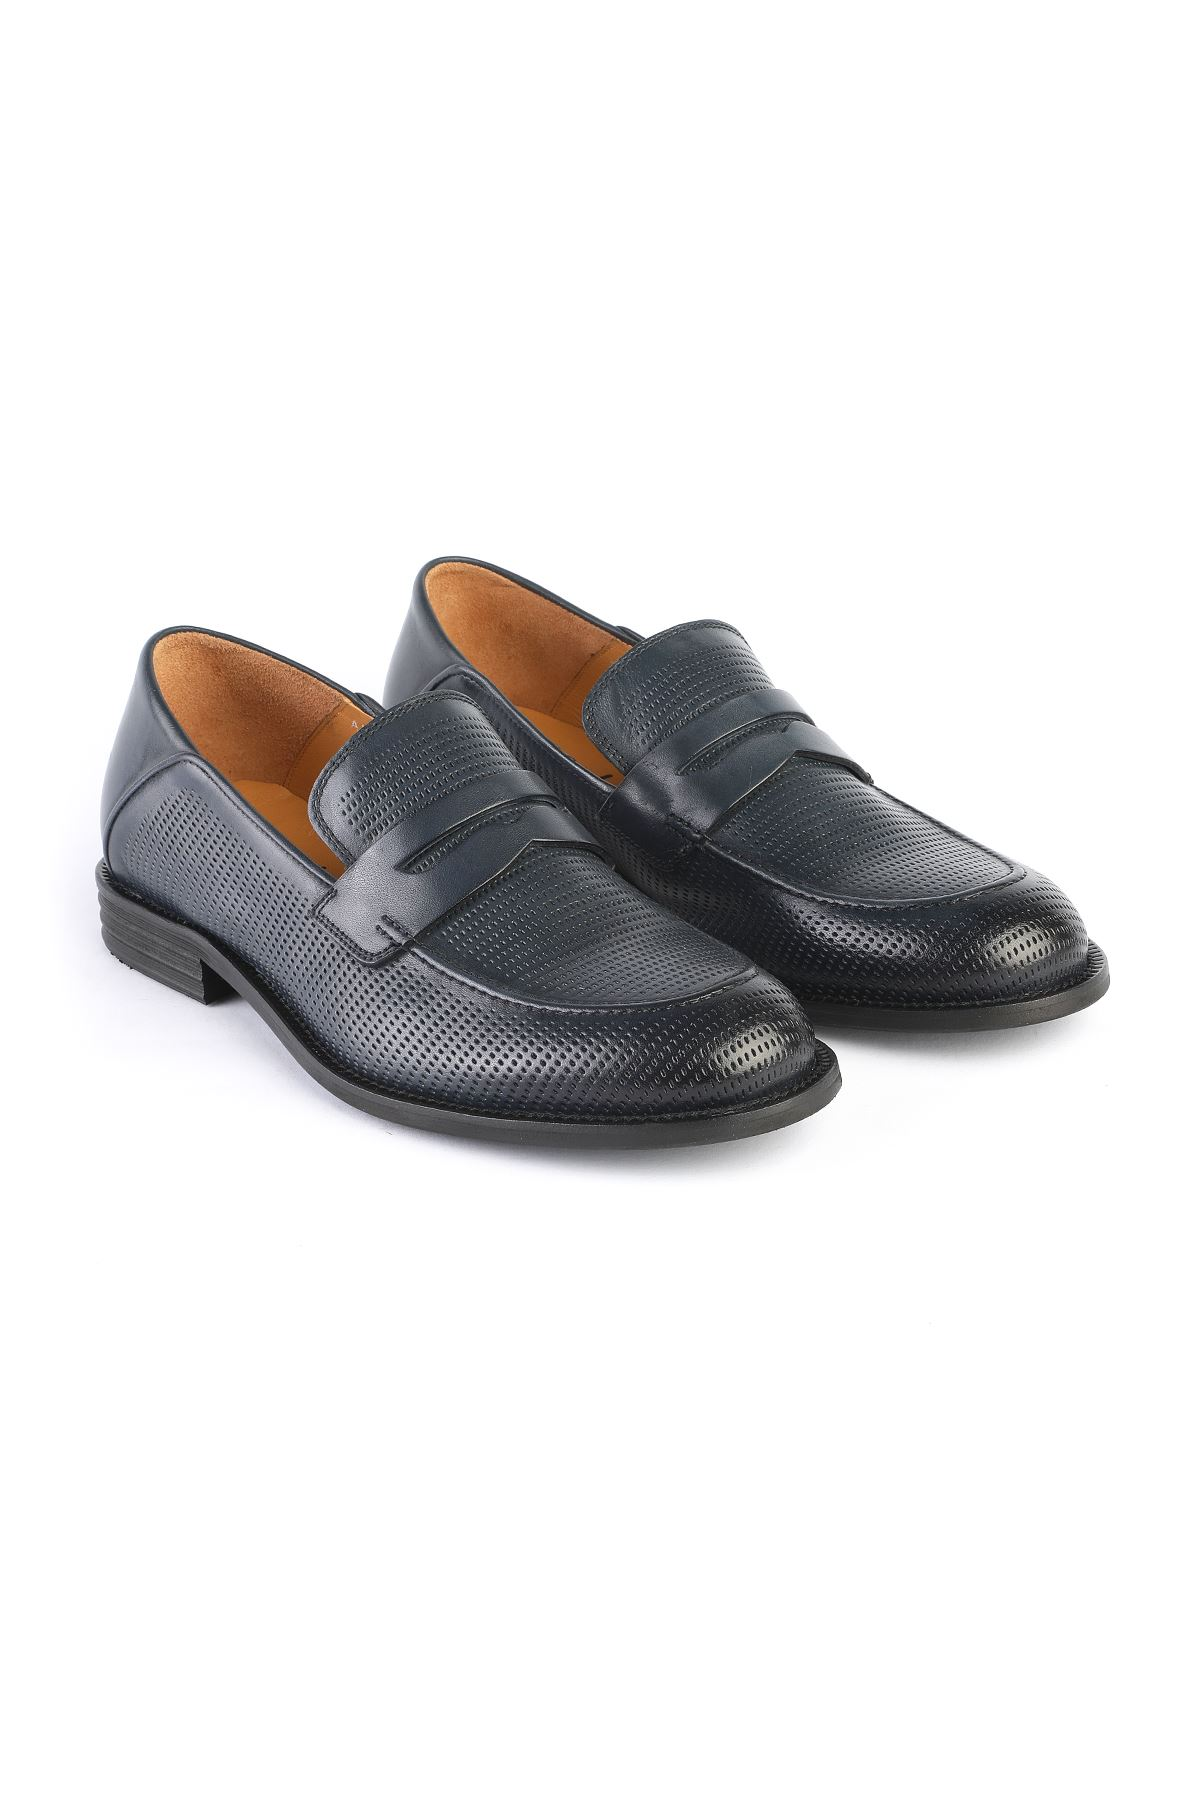 Libero 3211 Navy Blue Classic Shoes